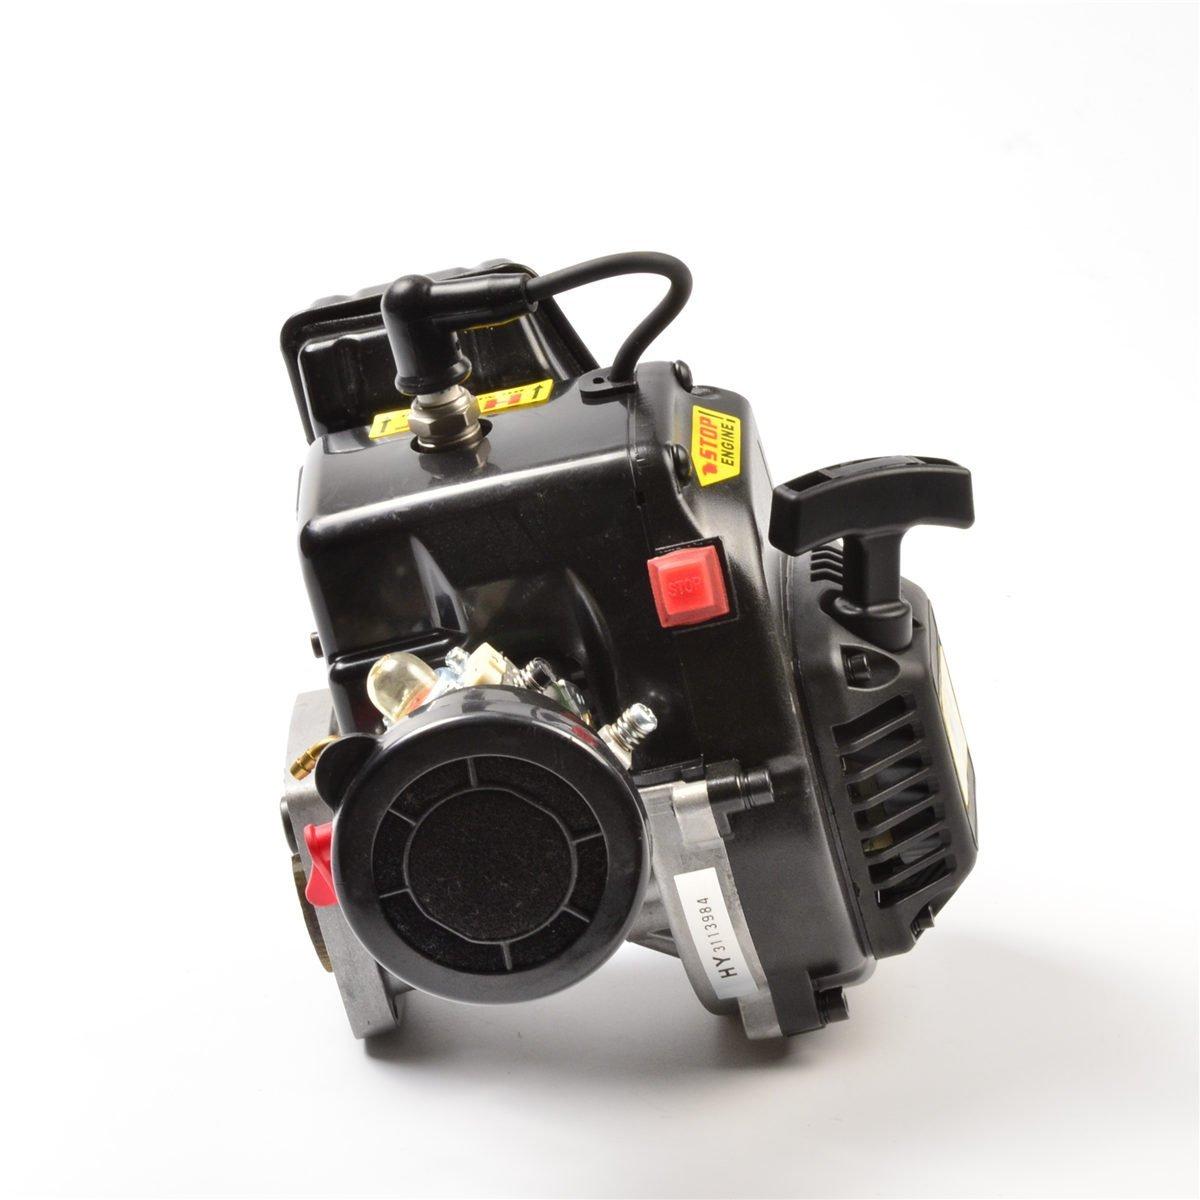 HSP 1/5 RC Model Car Engine 32CC 90-93# Gasoline Engines